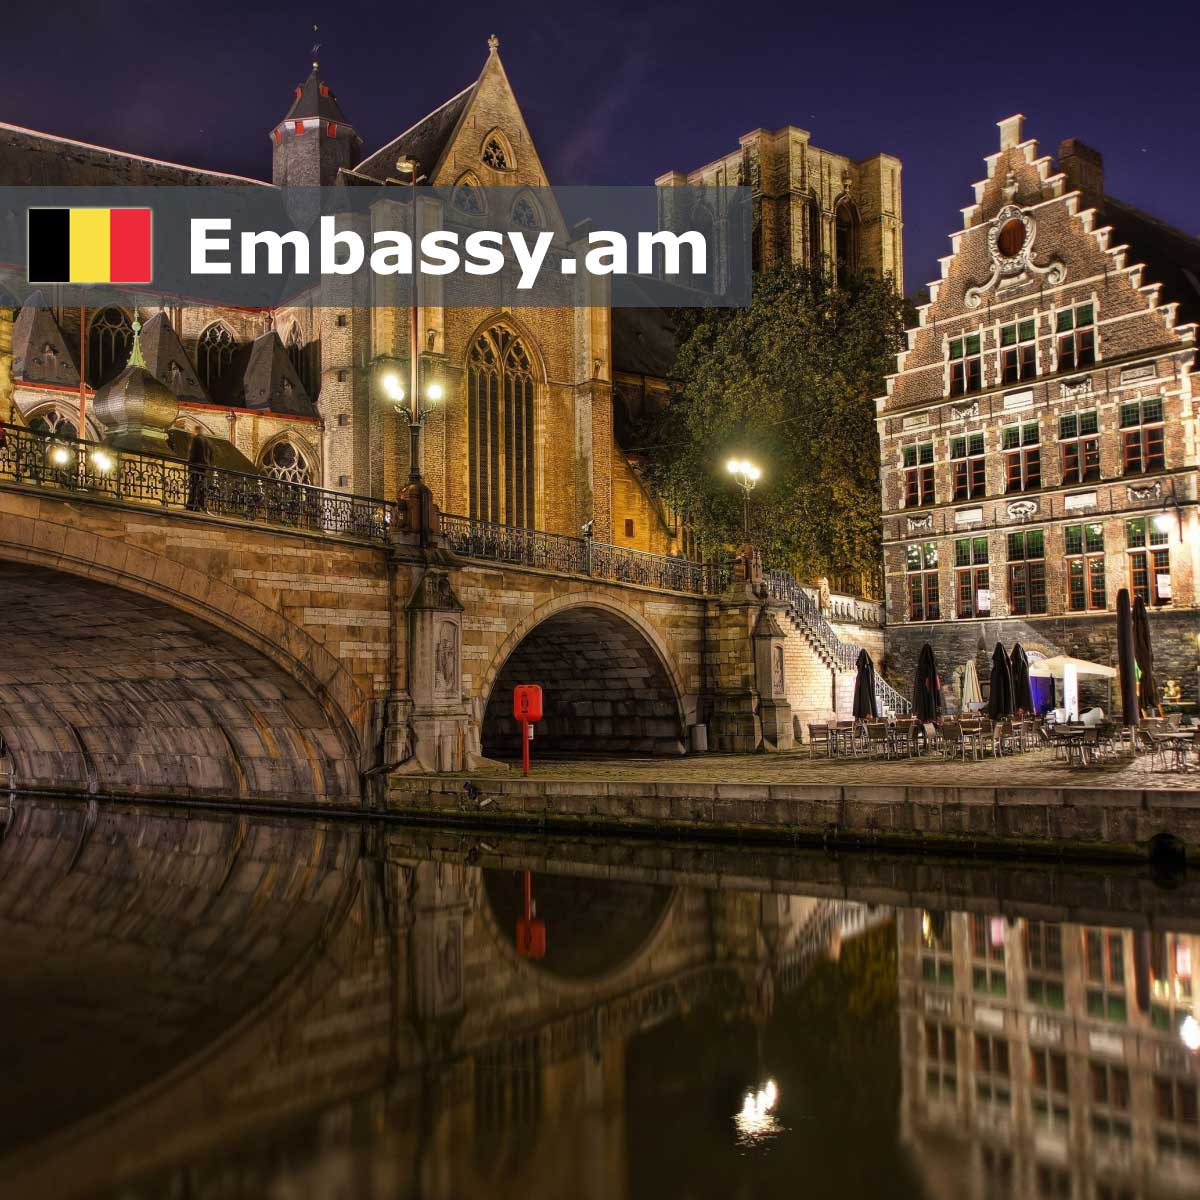 Ghent - Hotels in Belgium - Embassy.am